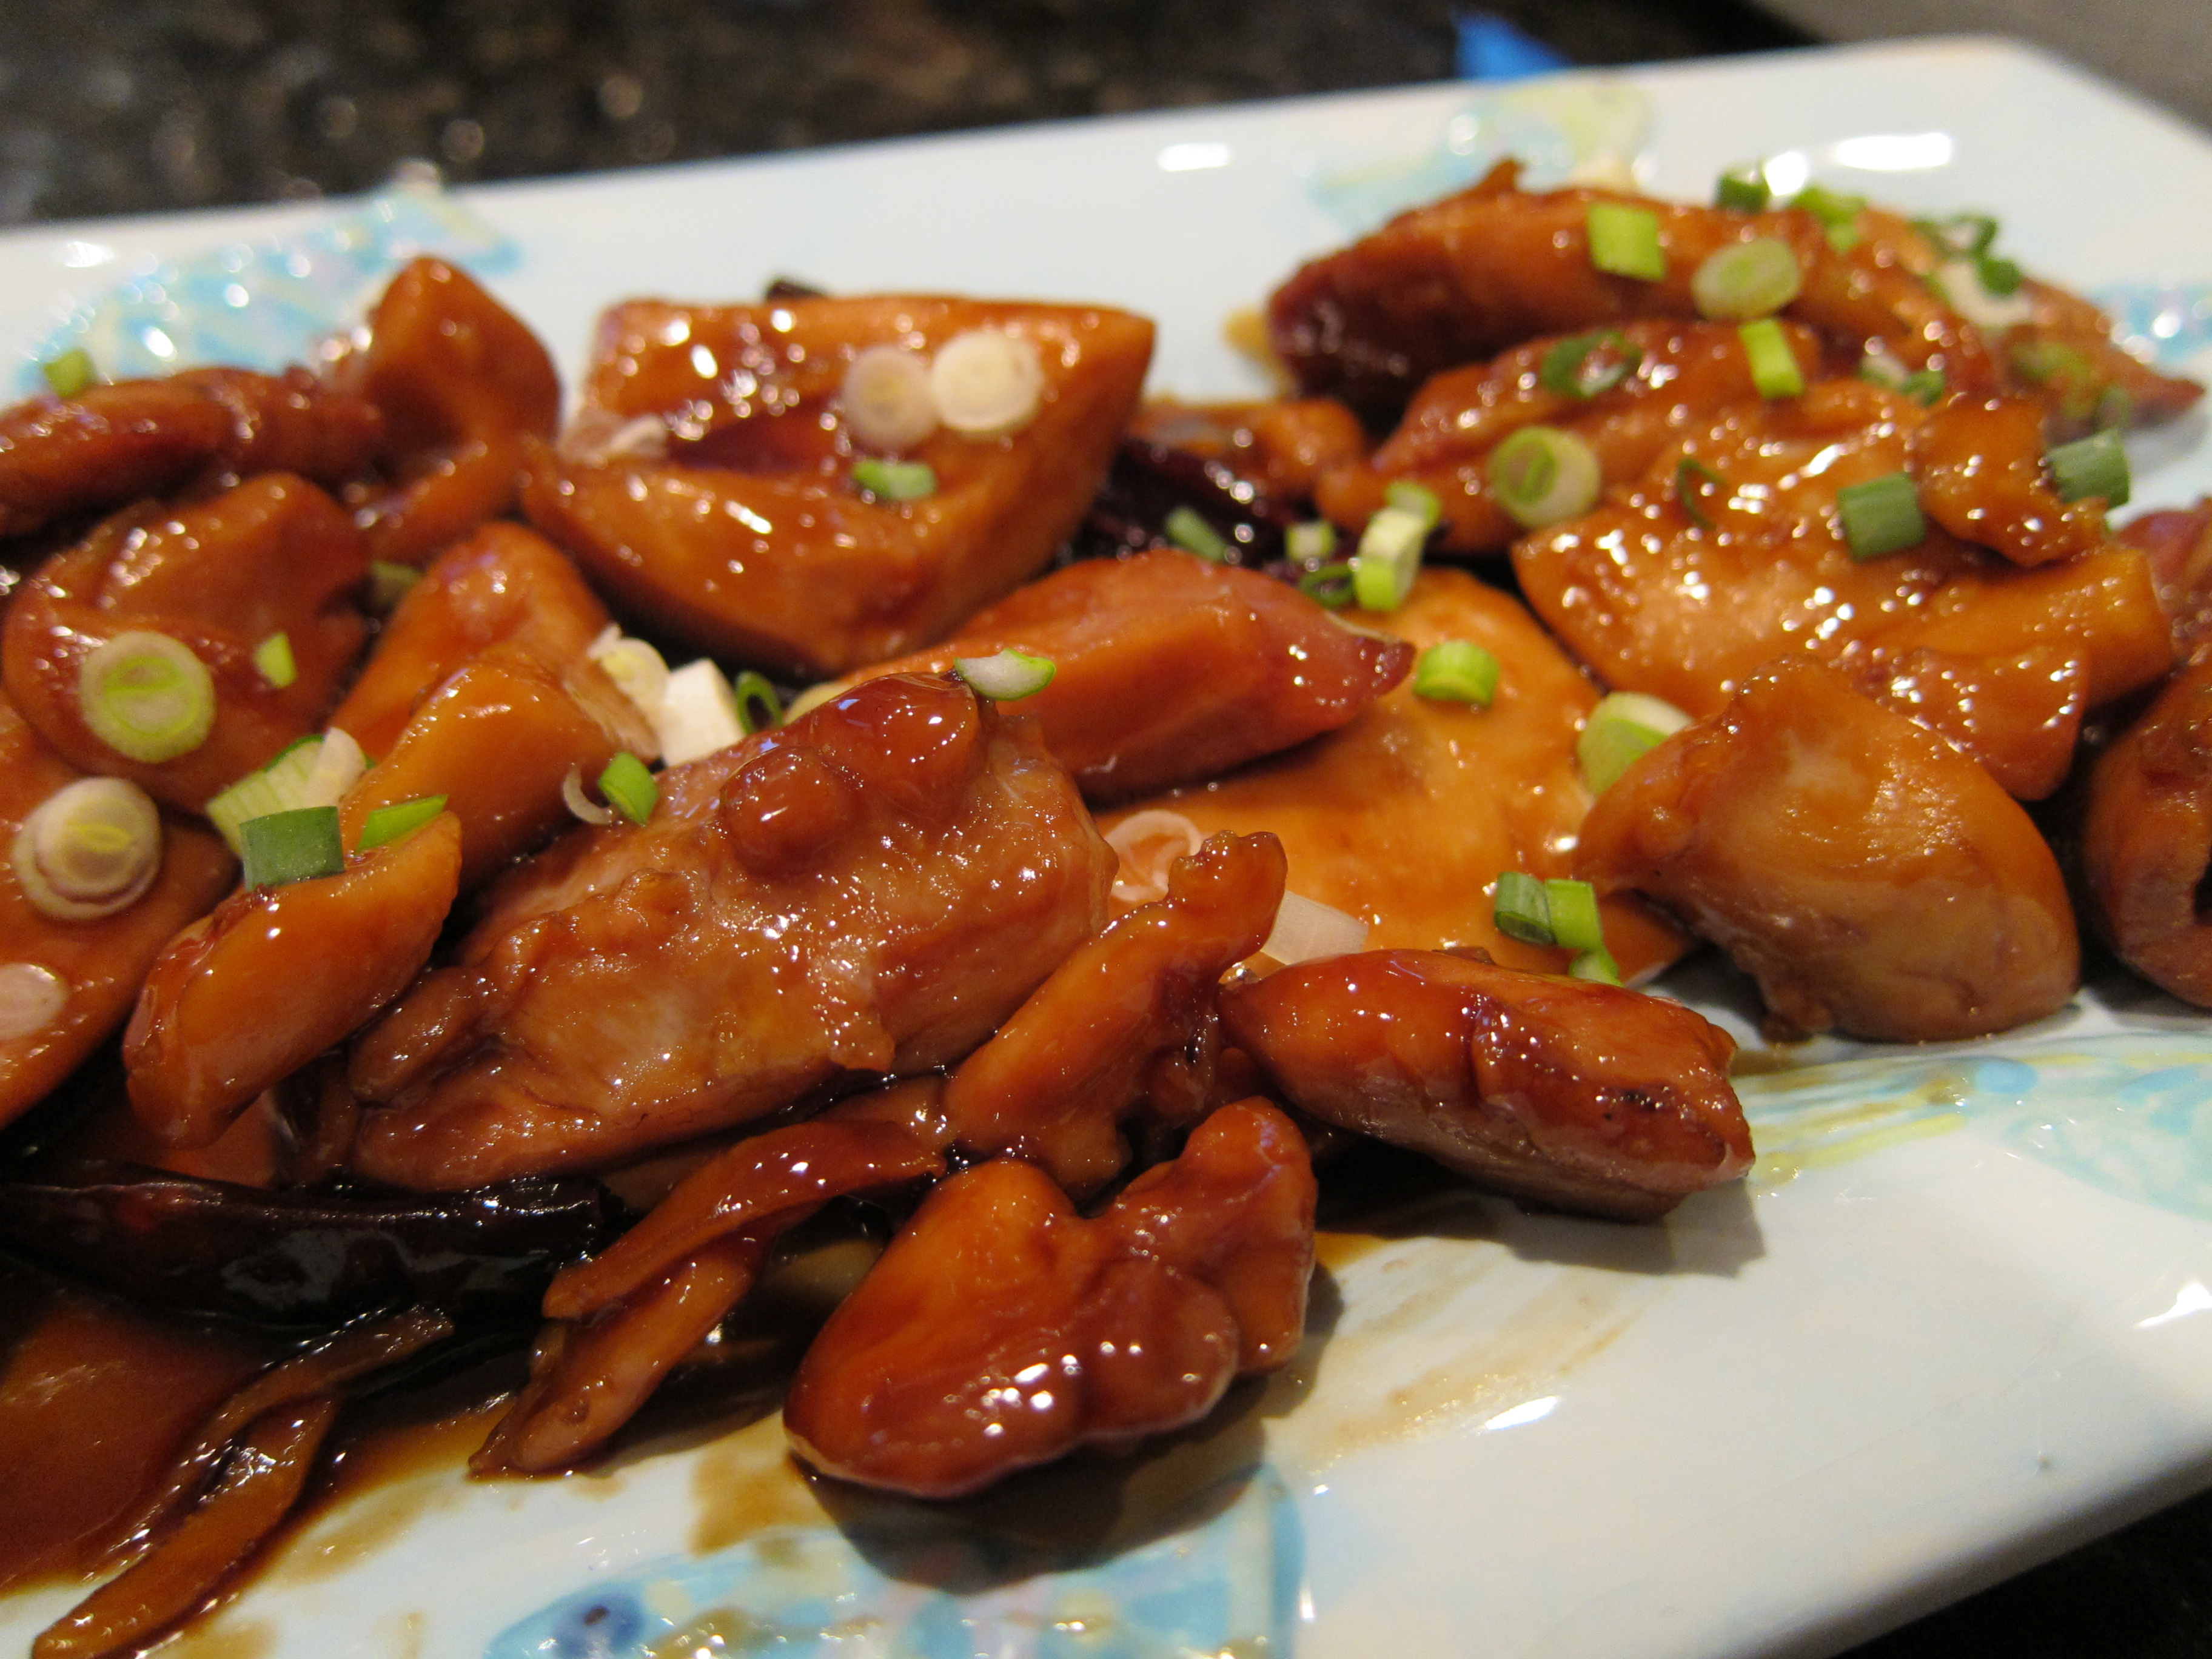 Boneless chicken thighs recipes